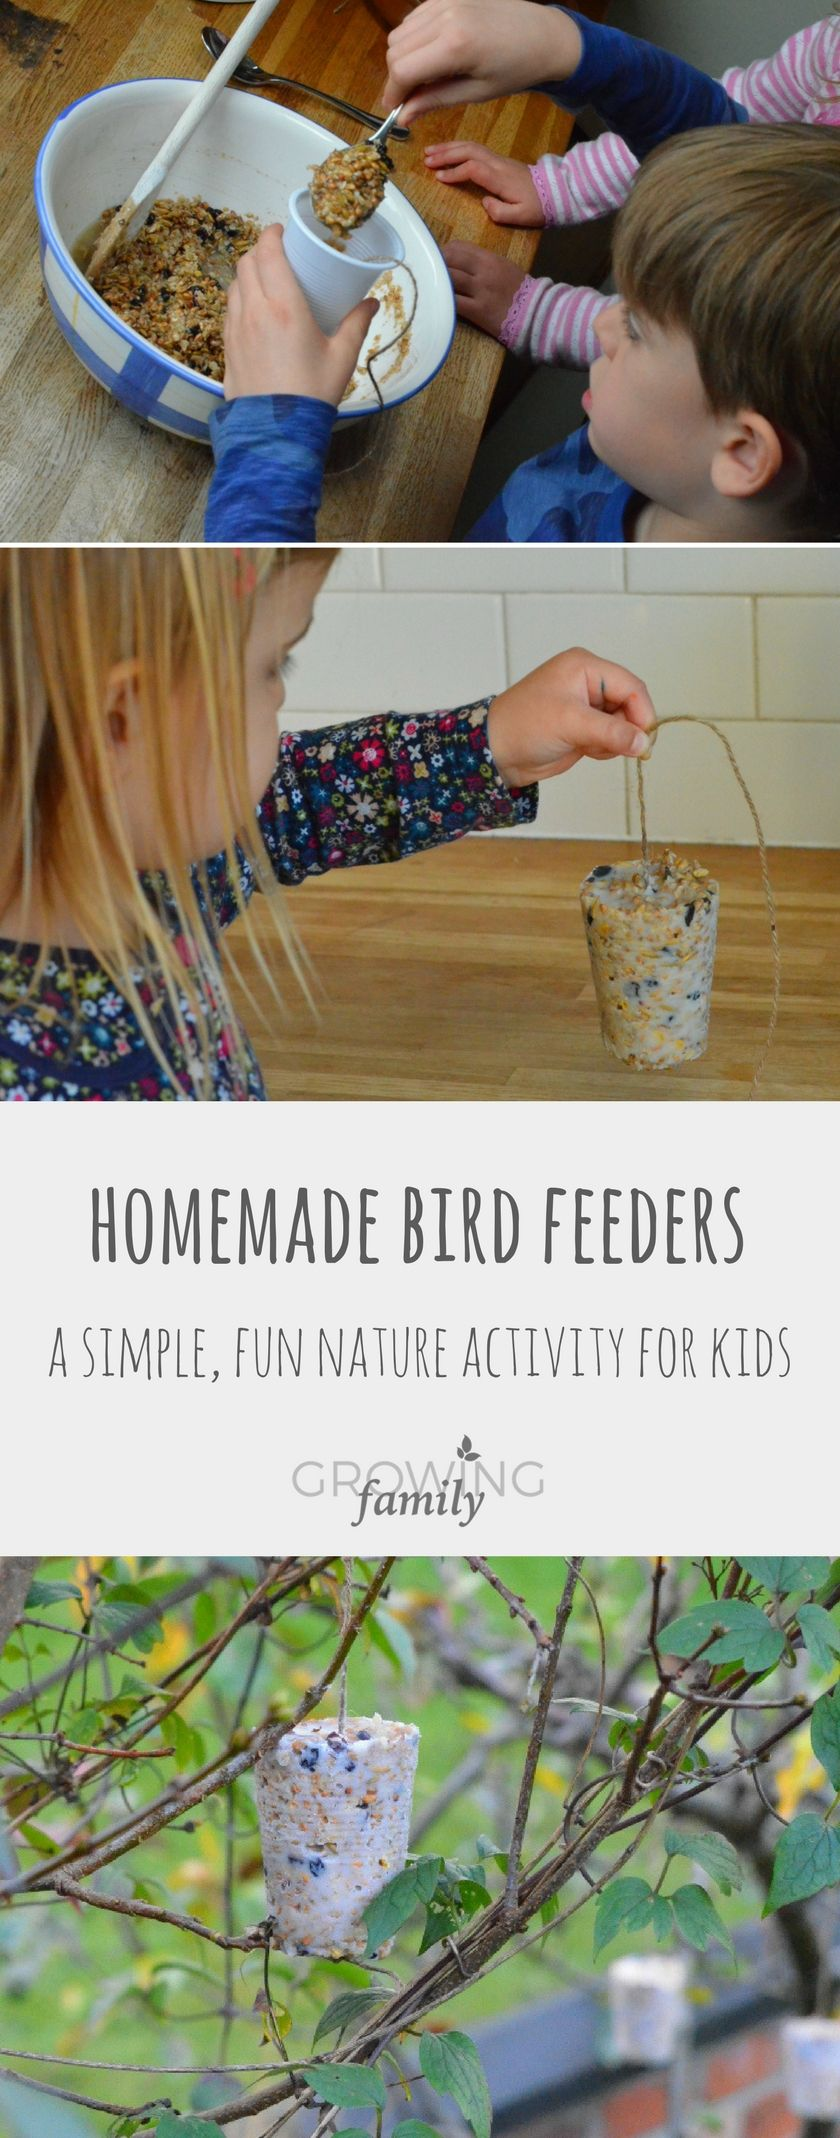 How to make homemade bird feeders - Growing Family